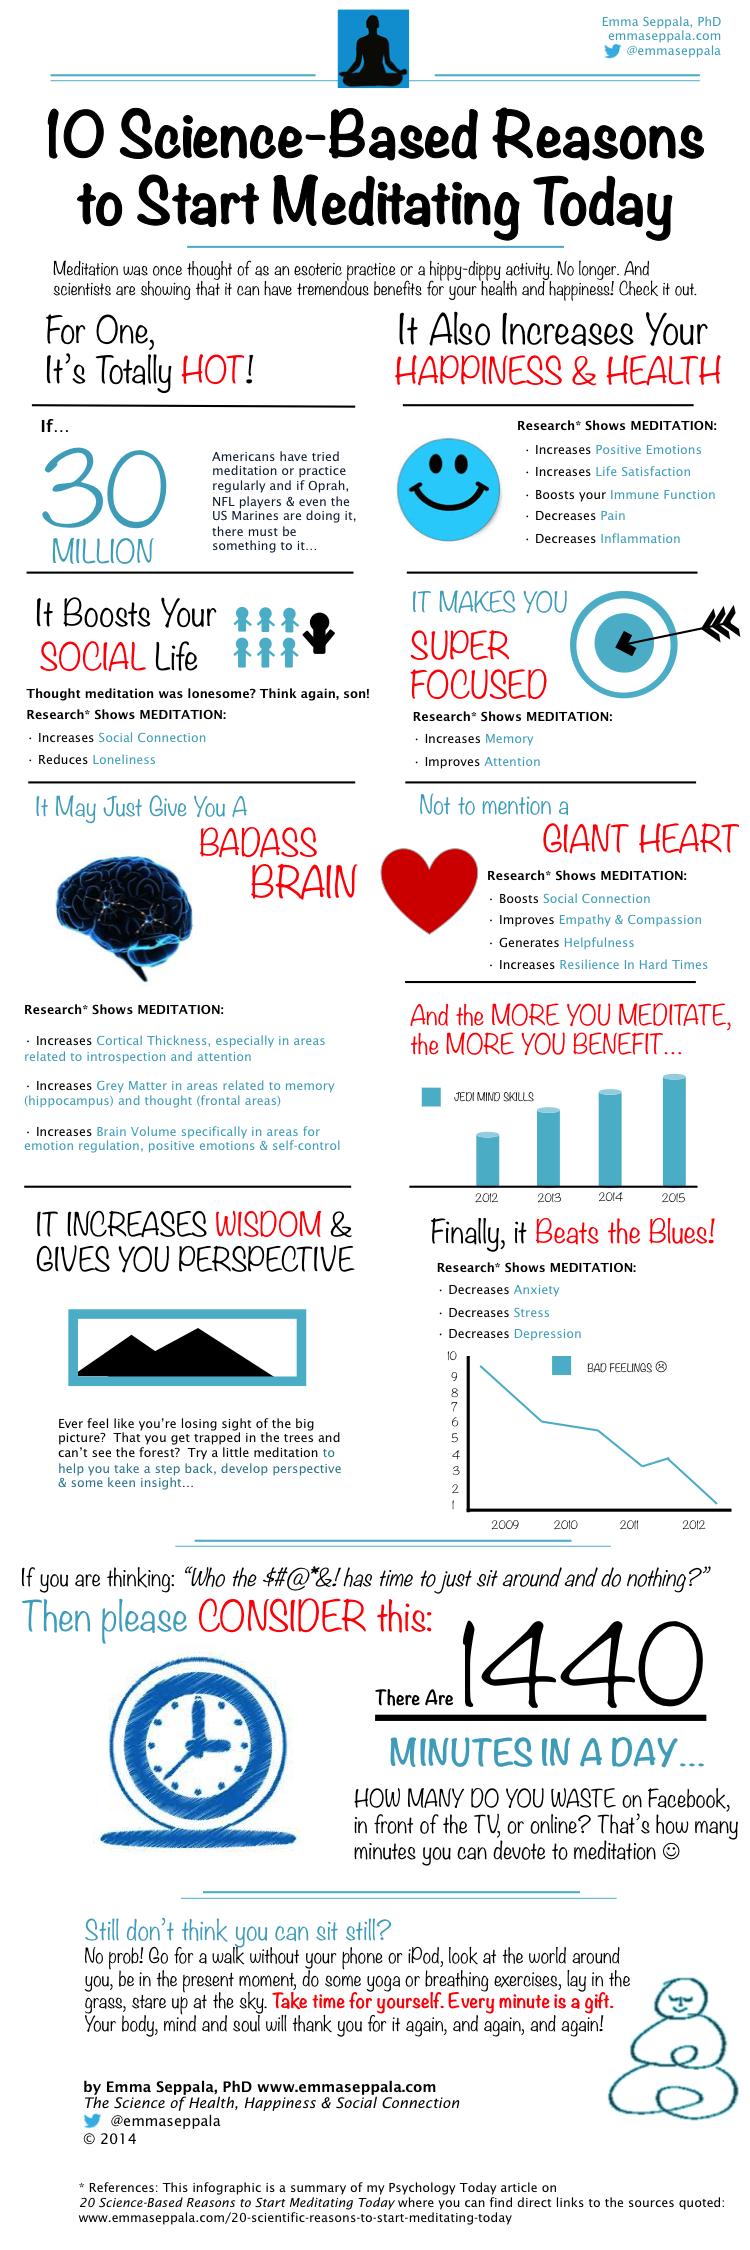 Meditation Heals Body and Mind